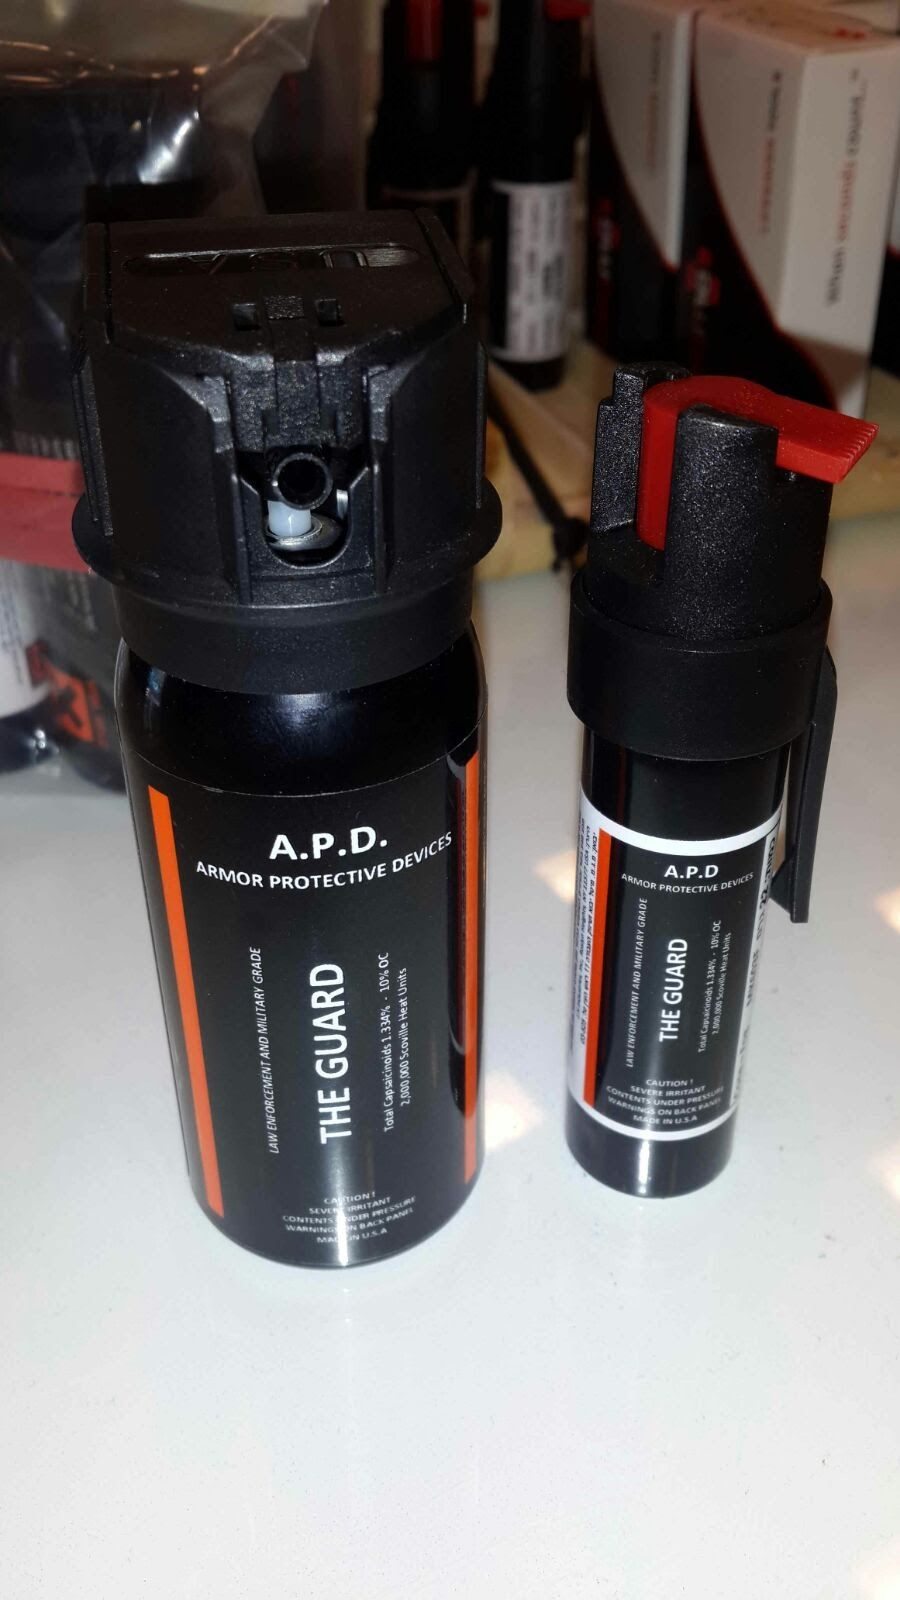 APD - תרסיס פלפל אישי קטן להגנה עצמית איי.פי.די - Armor protective devices Pepper Spray